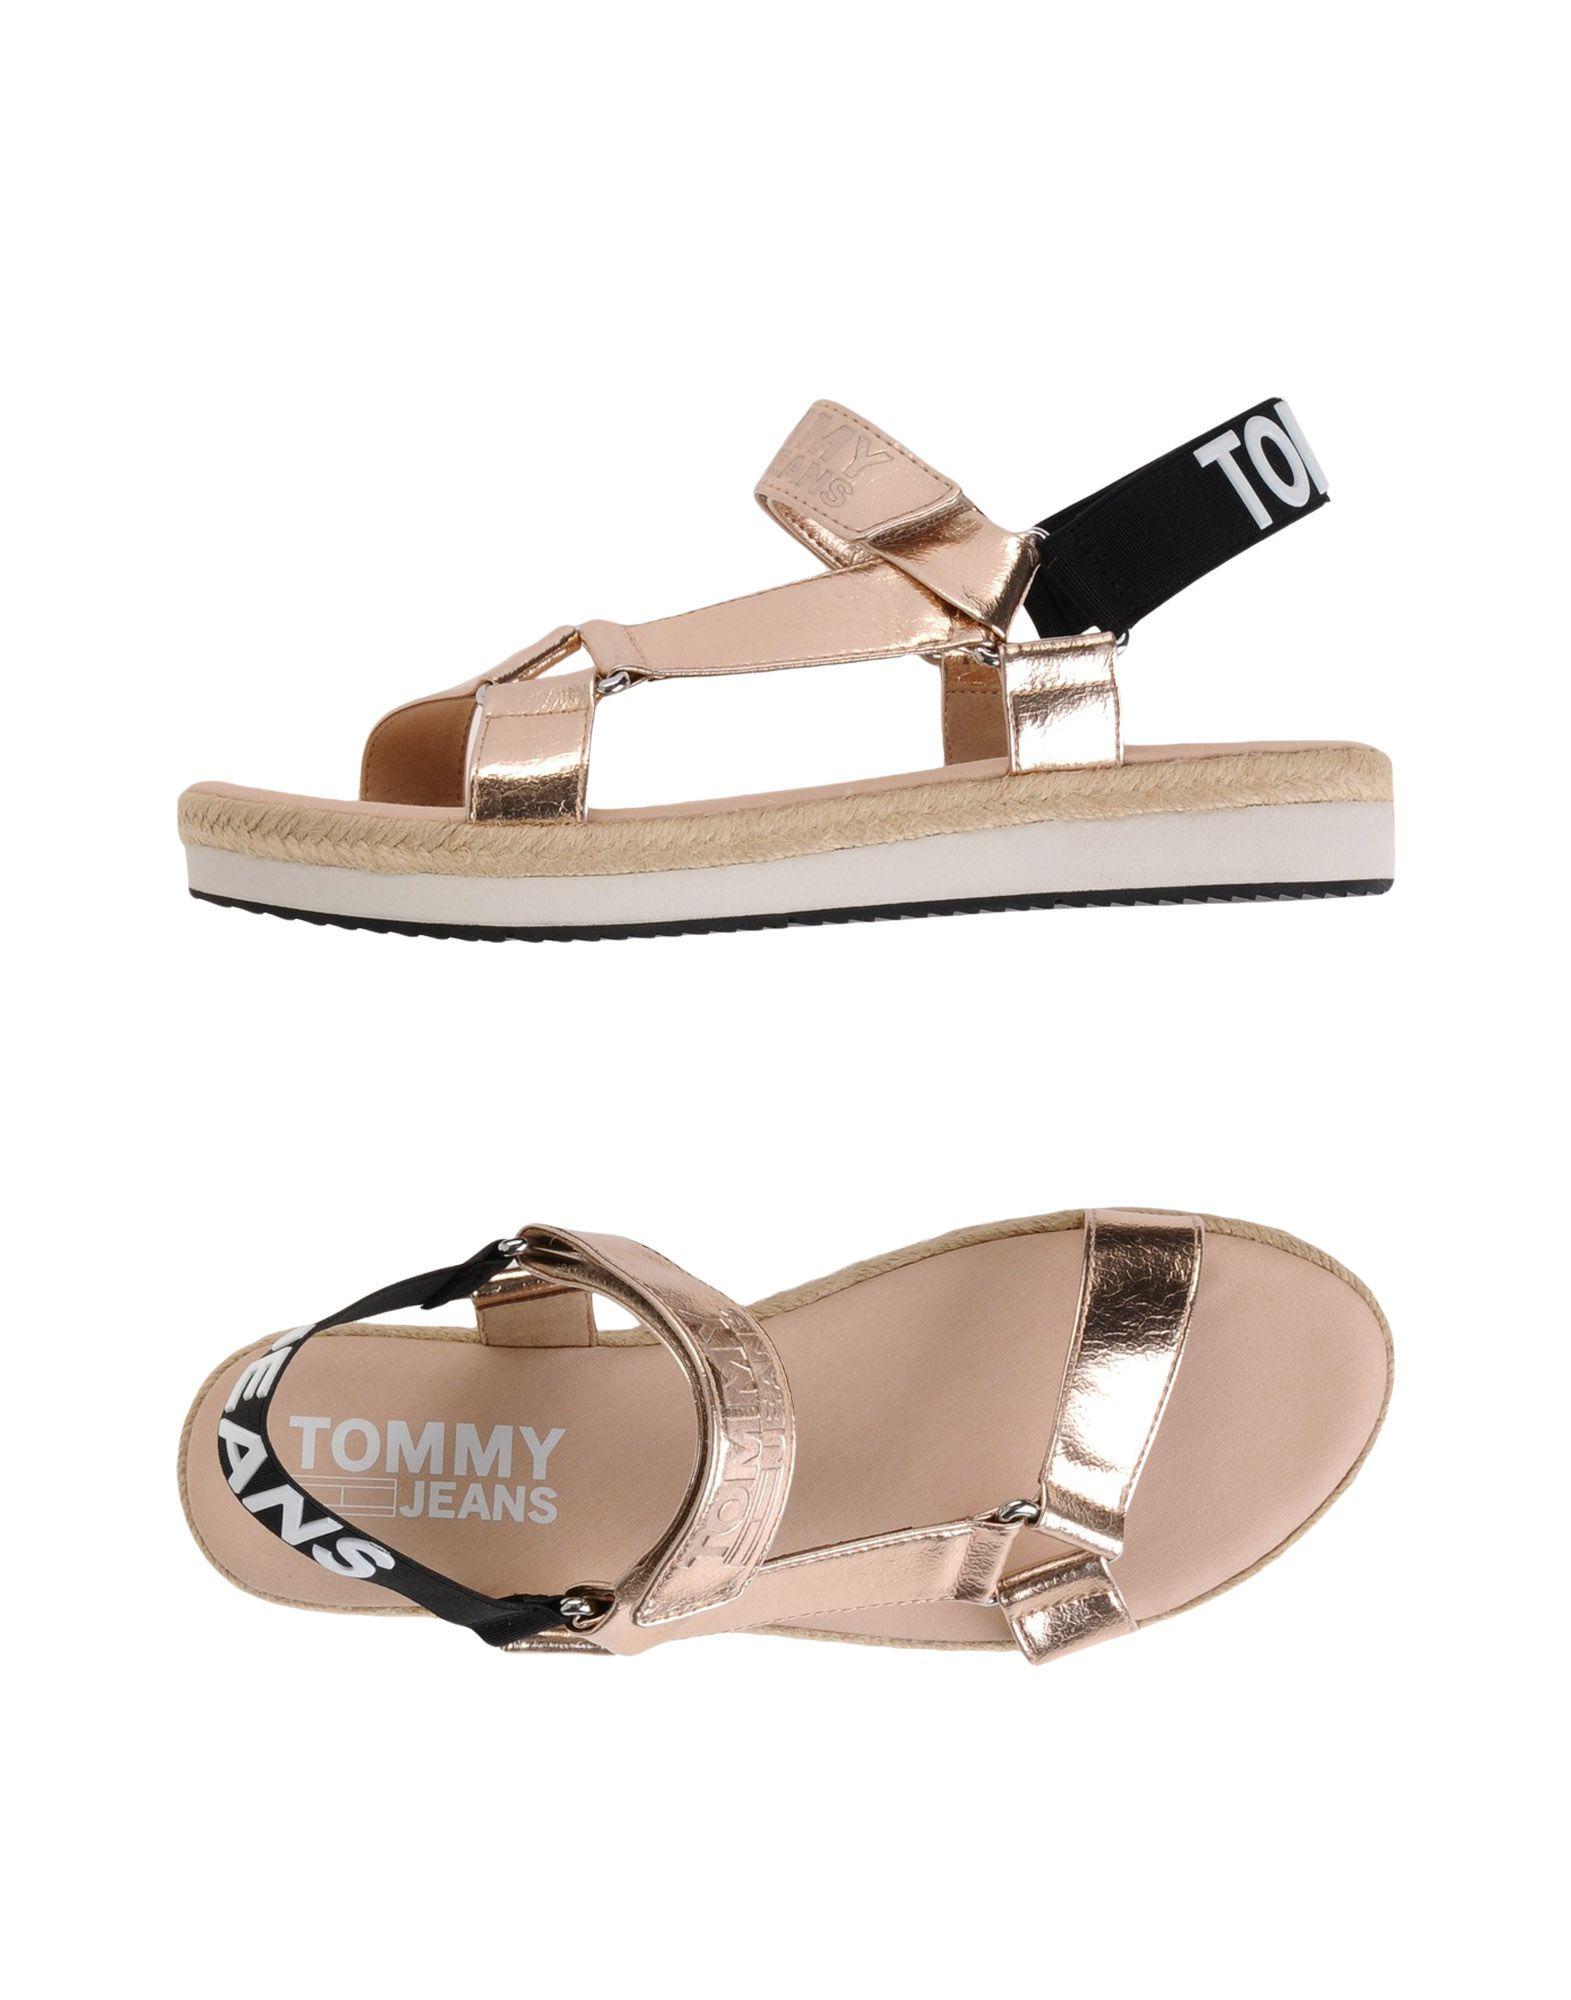 Sandales Tommy Jeans Femme - Sandales Tommy Jeans sur